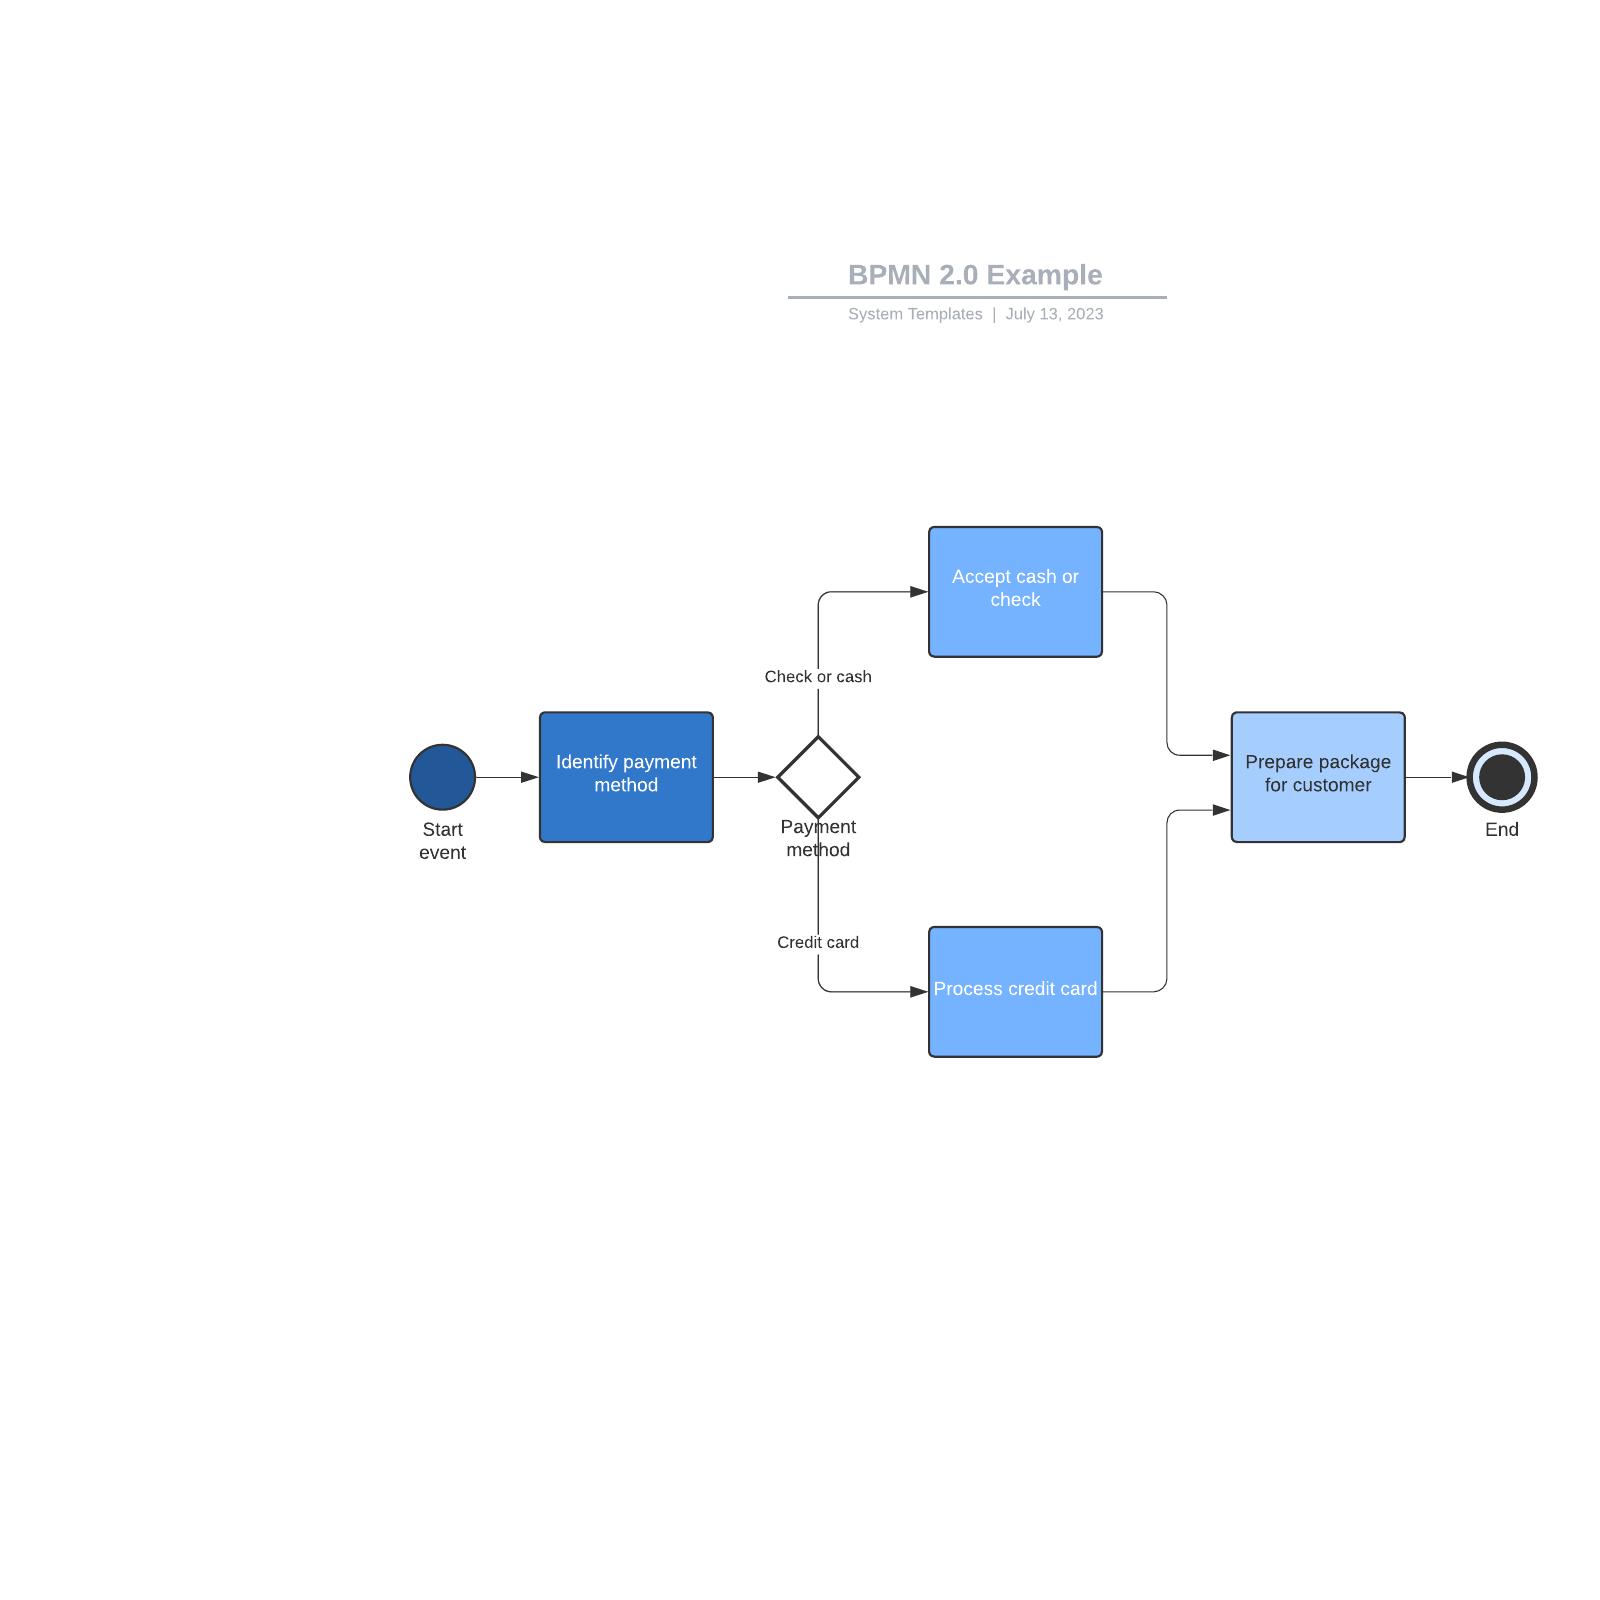 BPMN 2.0 Example